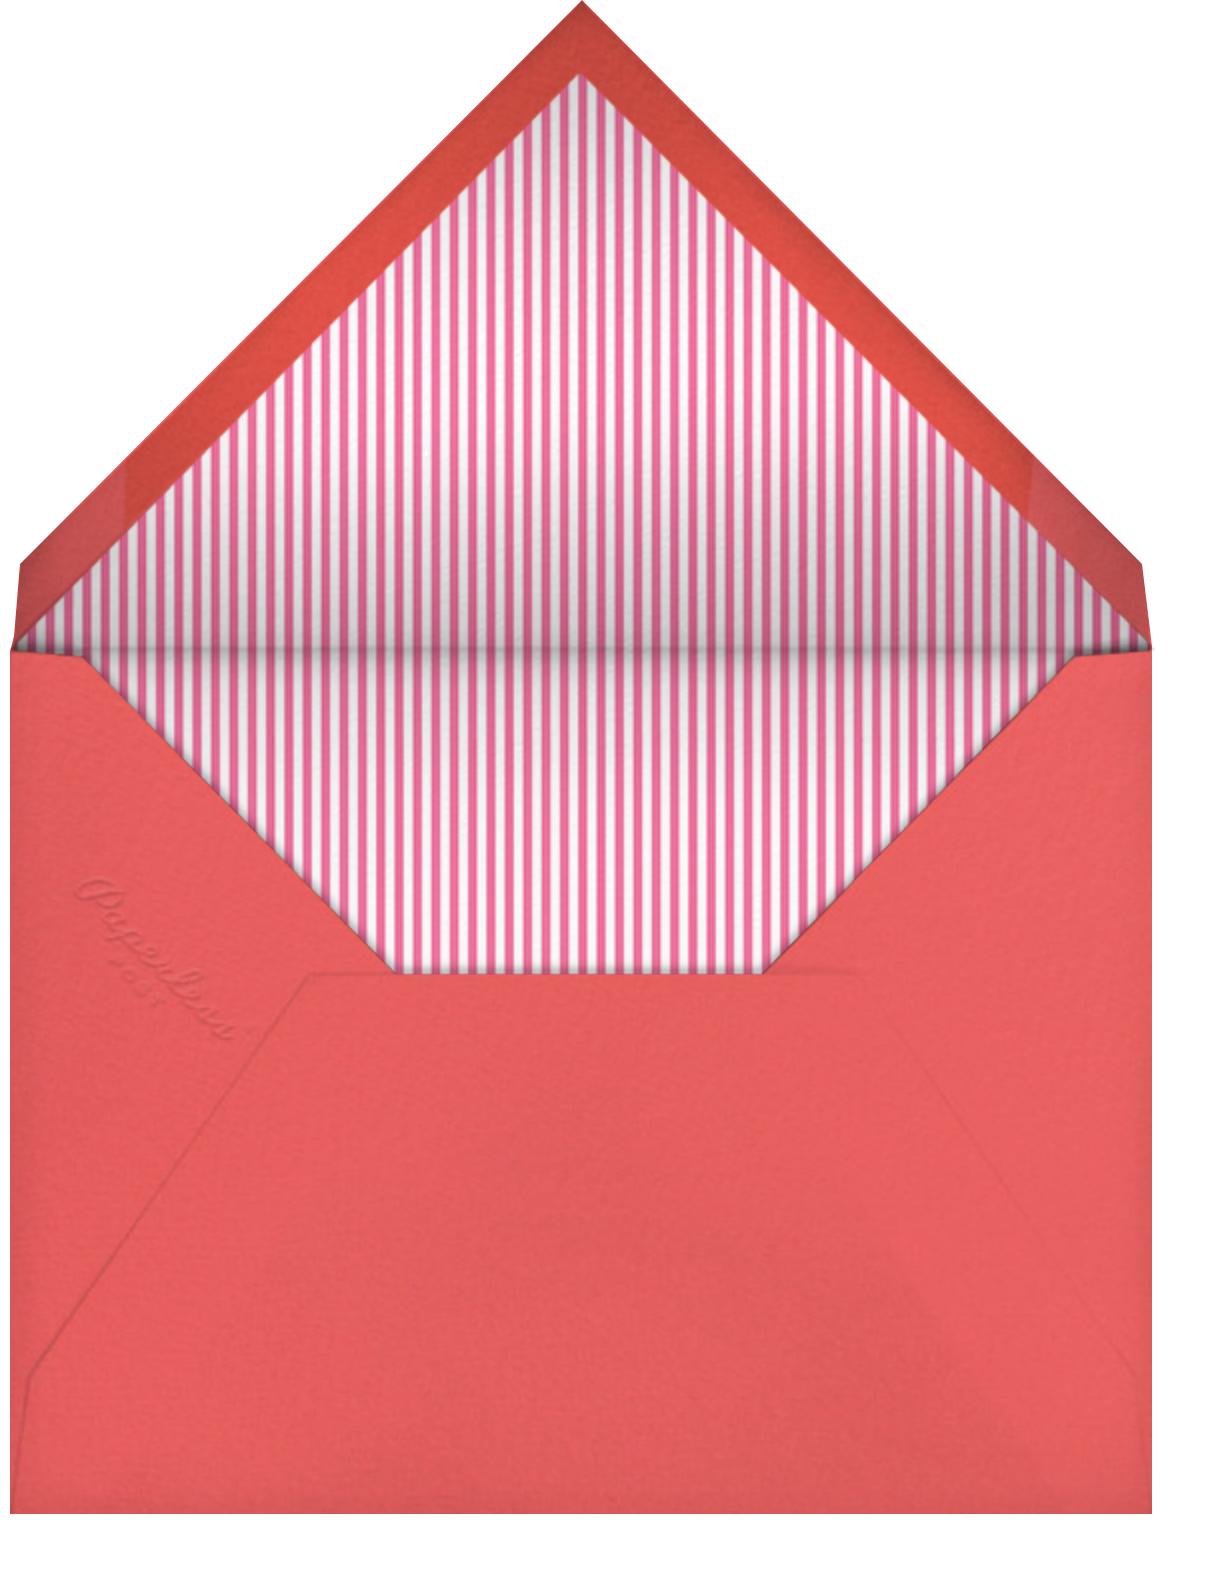 Birdie's Balloons (Greeting)  - Little Cube - Valentine's Day - envelope back